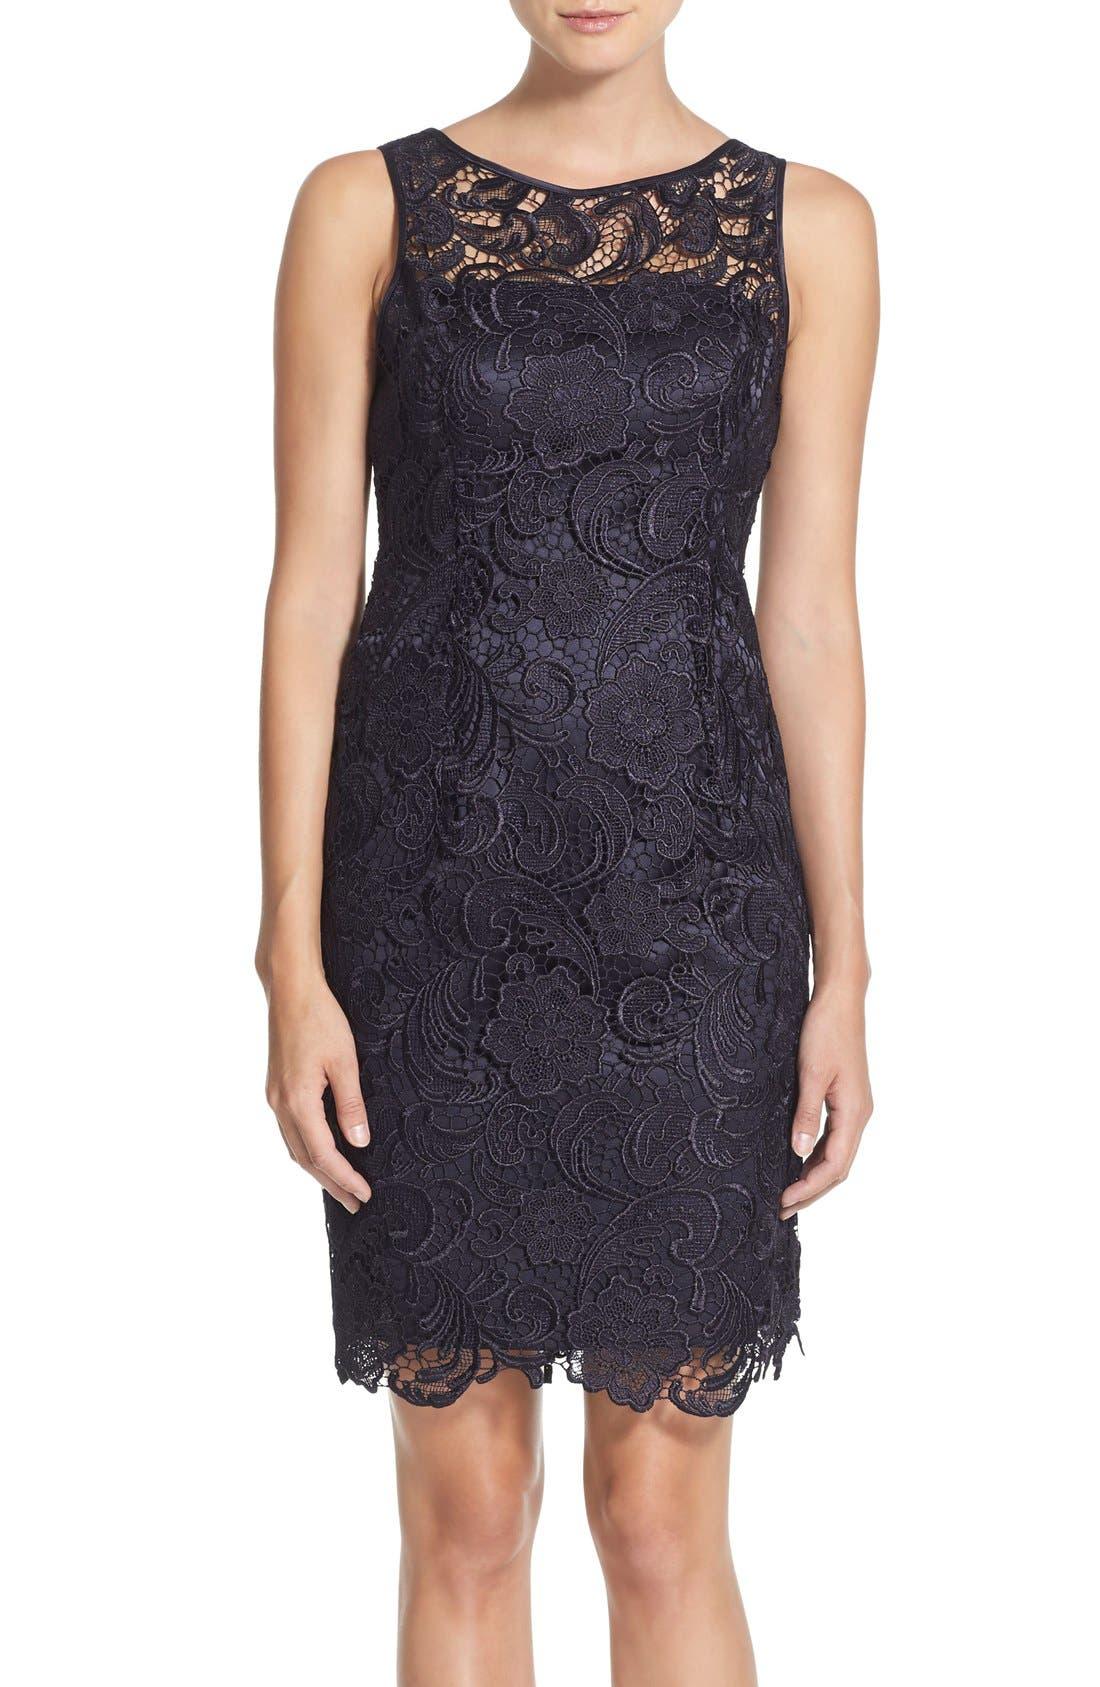 Alternate Image 1 Selected - Adrianna Papell Illusion Bodice Lace Sheath Dress